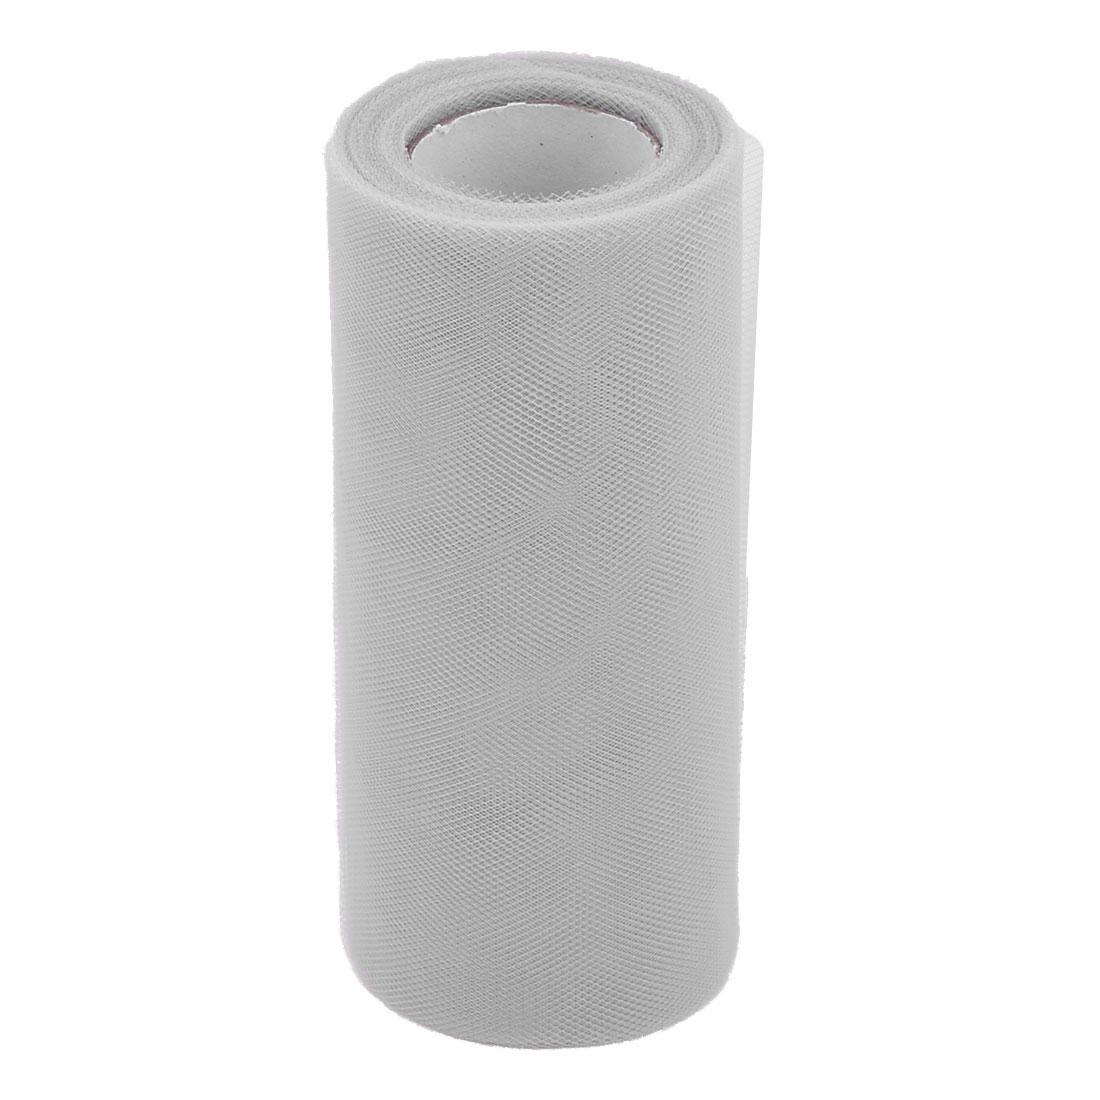 Wedding Gift Polyester DIY Dress Tutu Decor Tulle Spool Roll Light Gray 6 Inch x 25 Yards